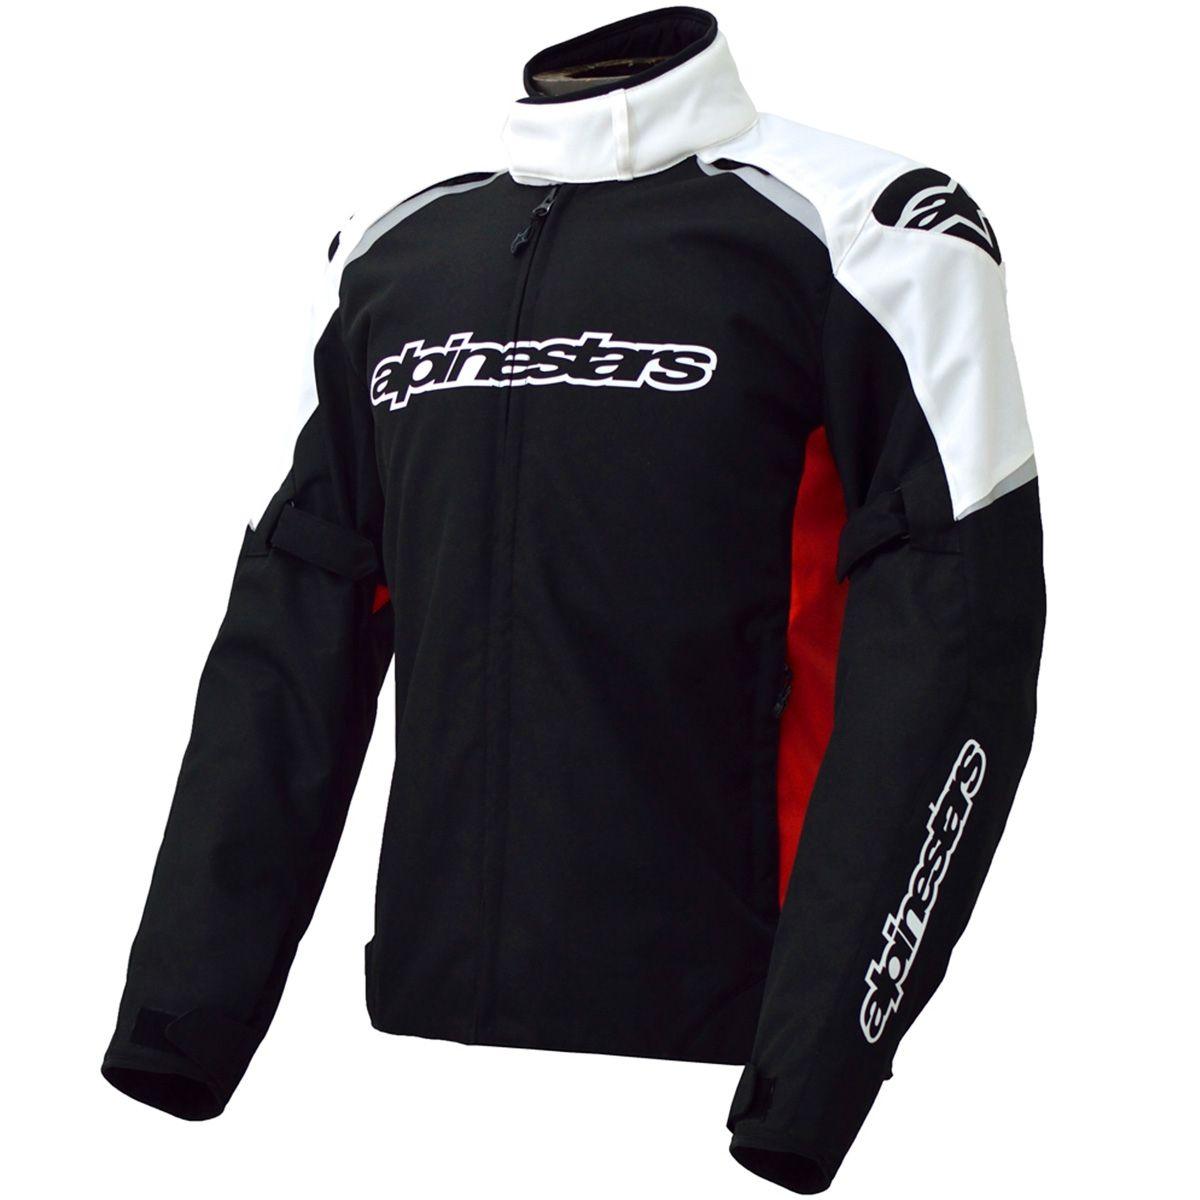 0e6fecf79 Jaqueta Moto Alpinestars Alux 100% Impermeável - Preta